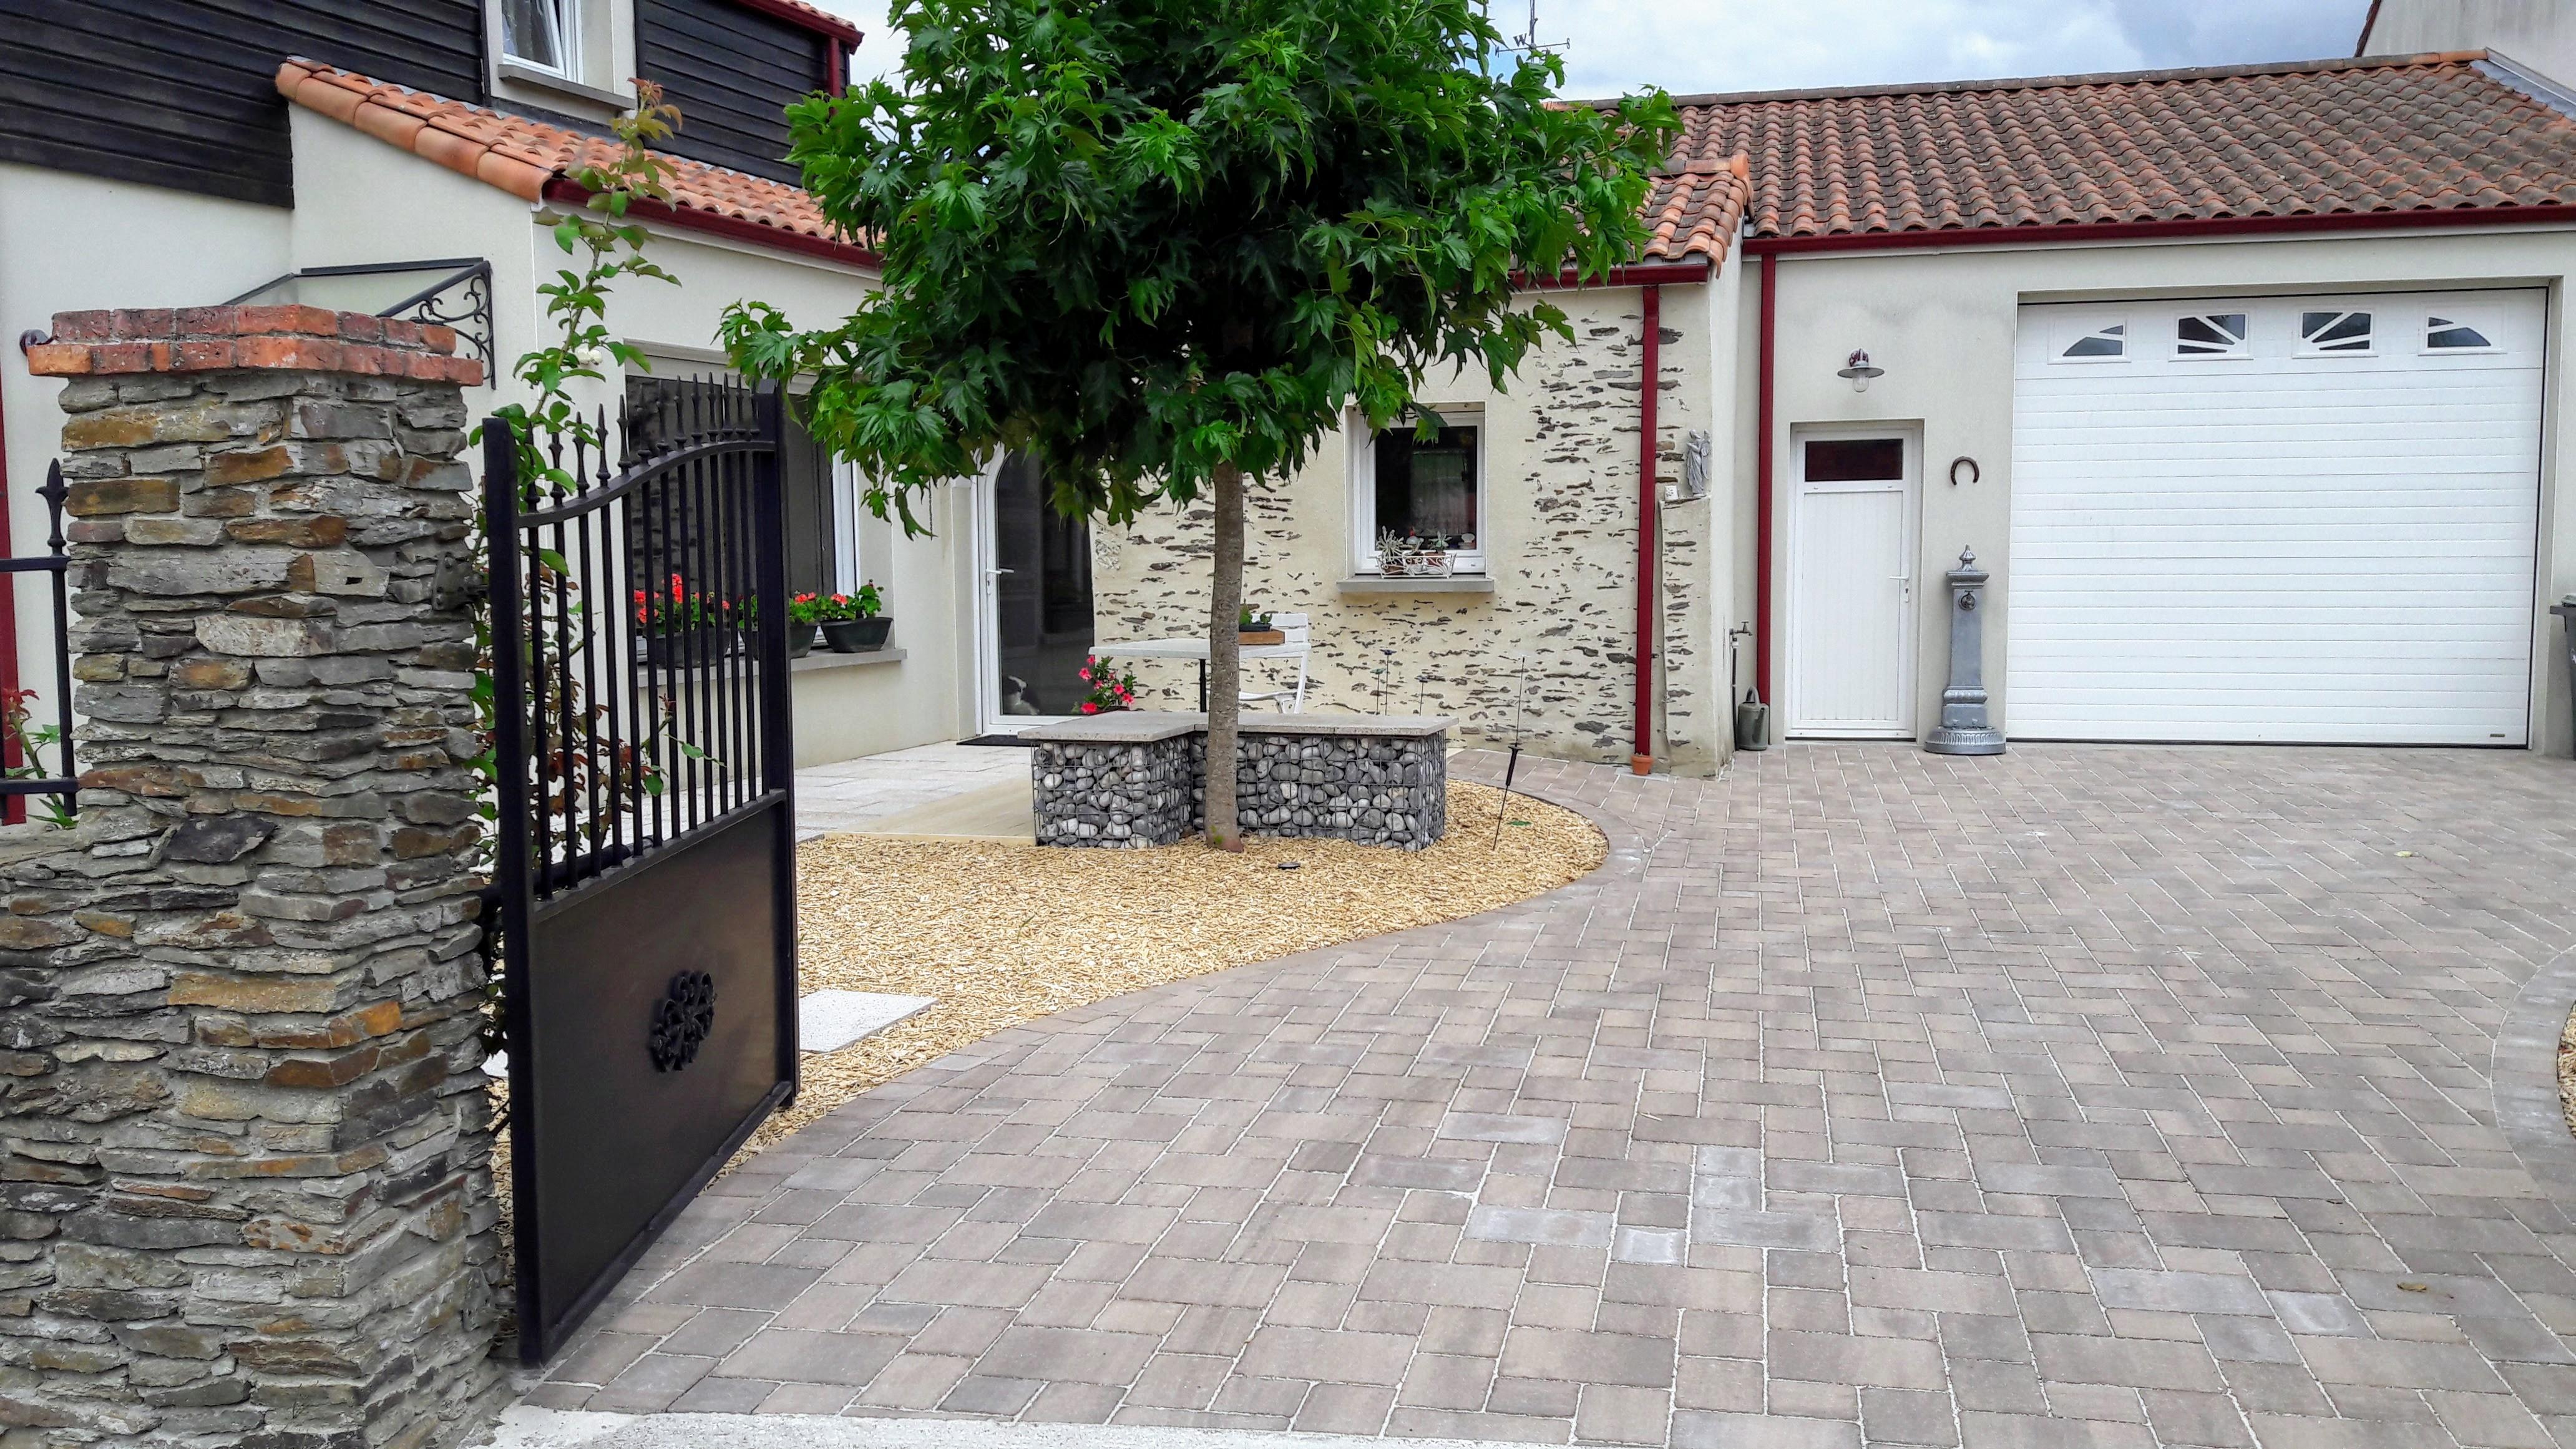 Les Jardins Du Moulin Paysagiste jardins du moulin paysagiste - allée en pavage terrasse et